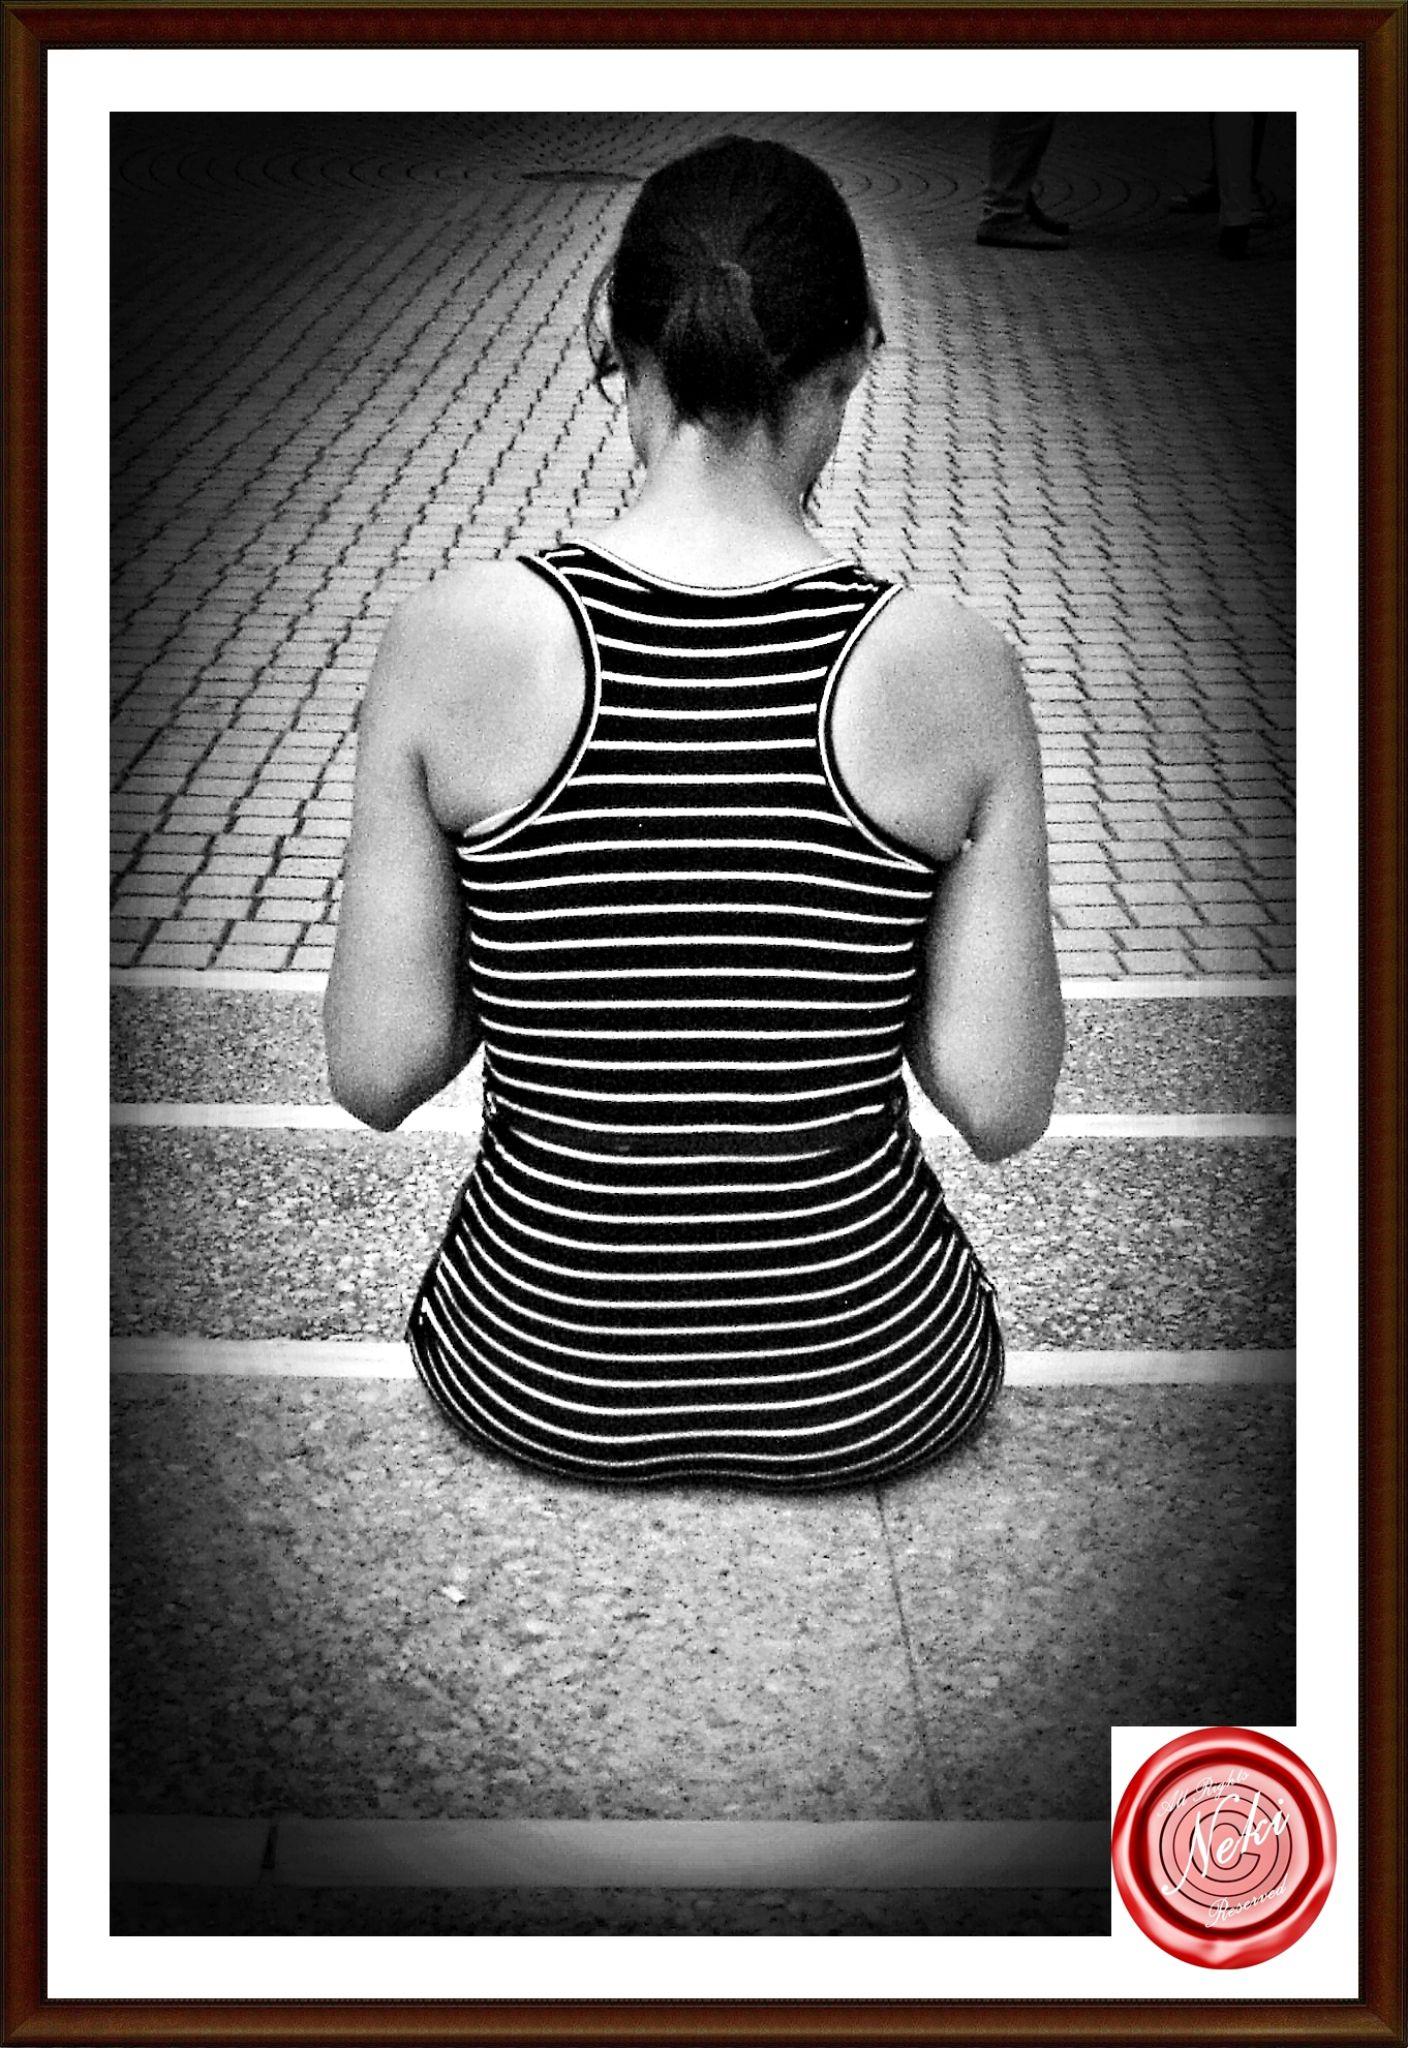 Untitled by Neki Fotograf